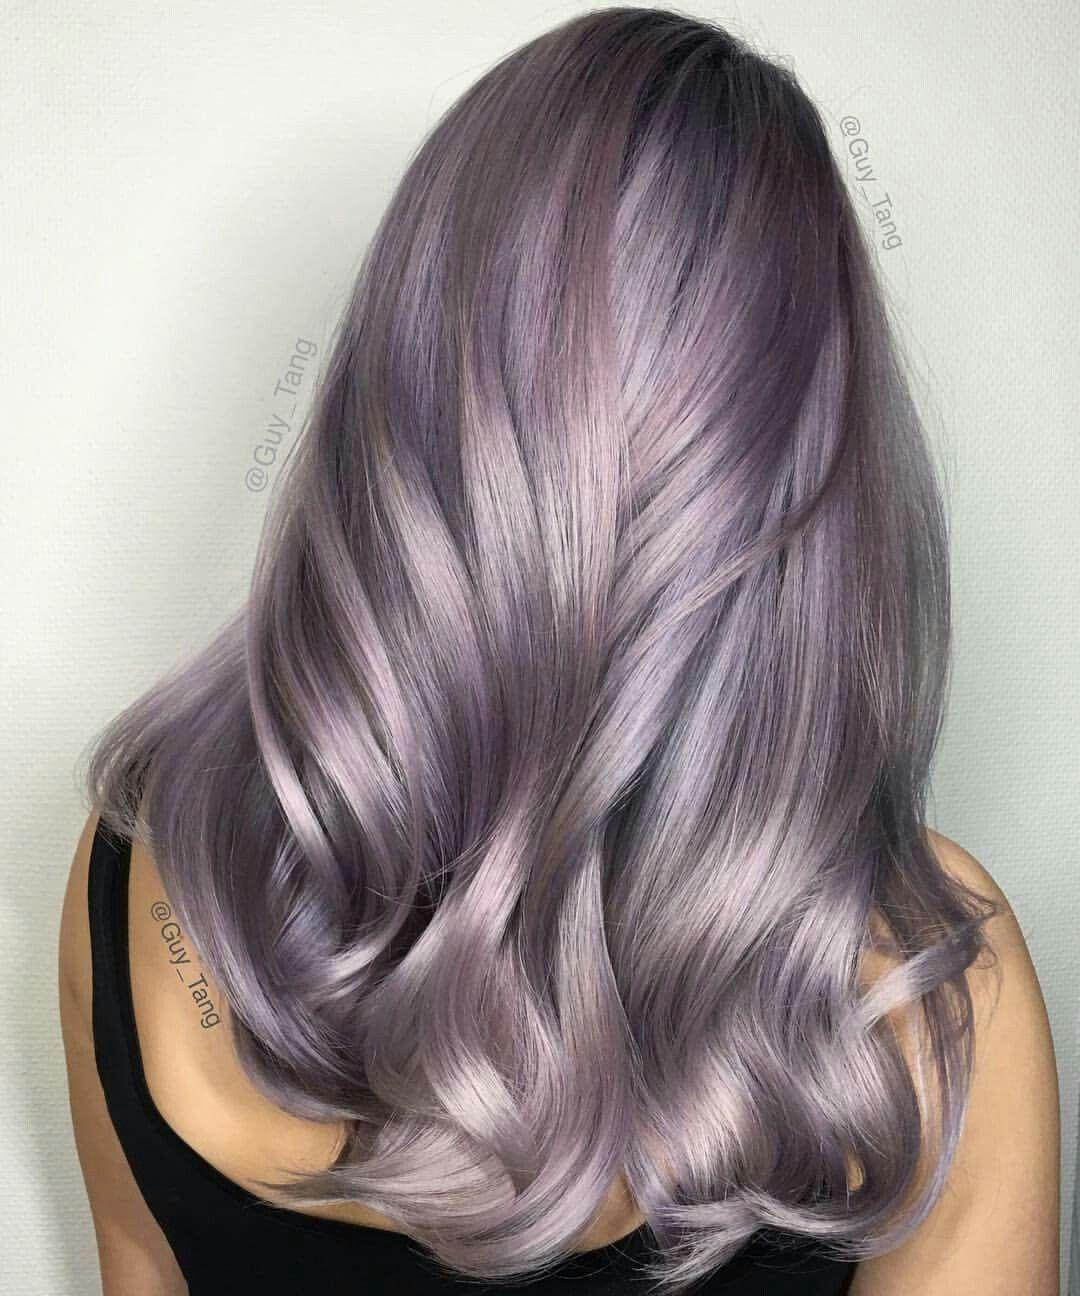 Pin By Clara Mott On Hair Things Lilac Hair Color Metallic Hair Cool Hair Color